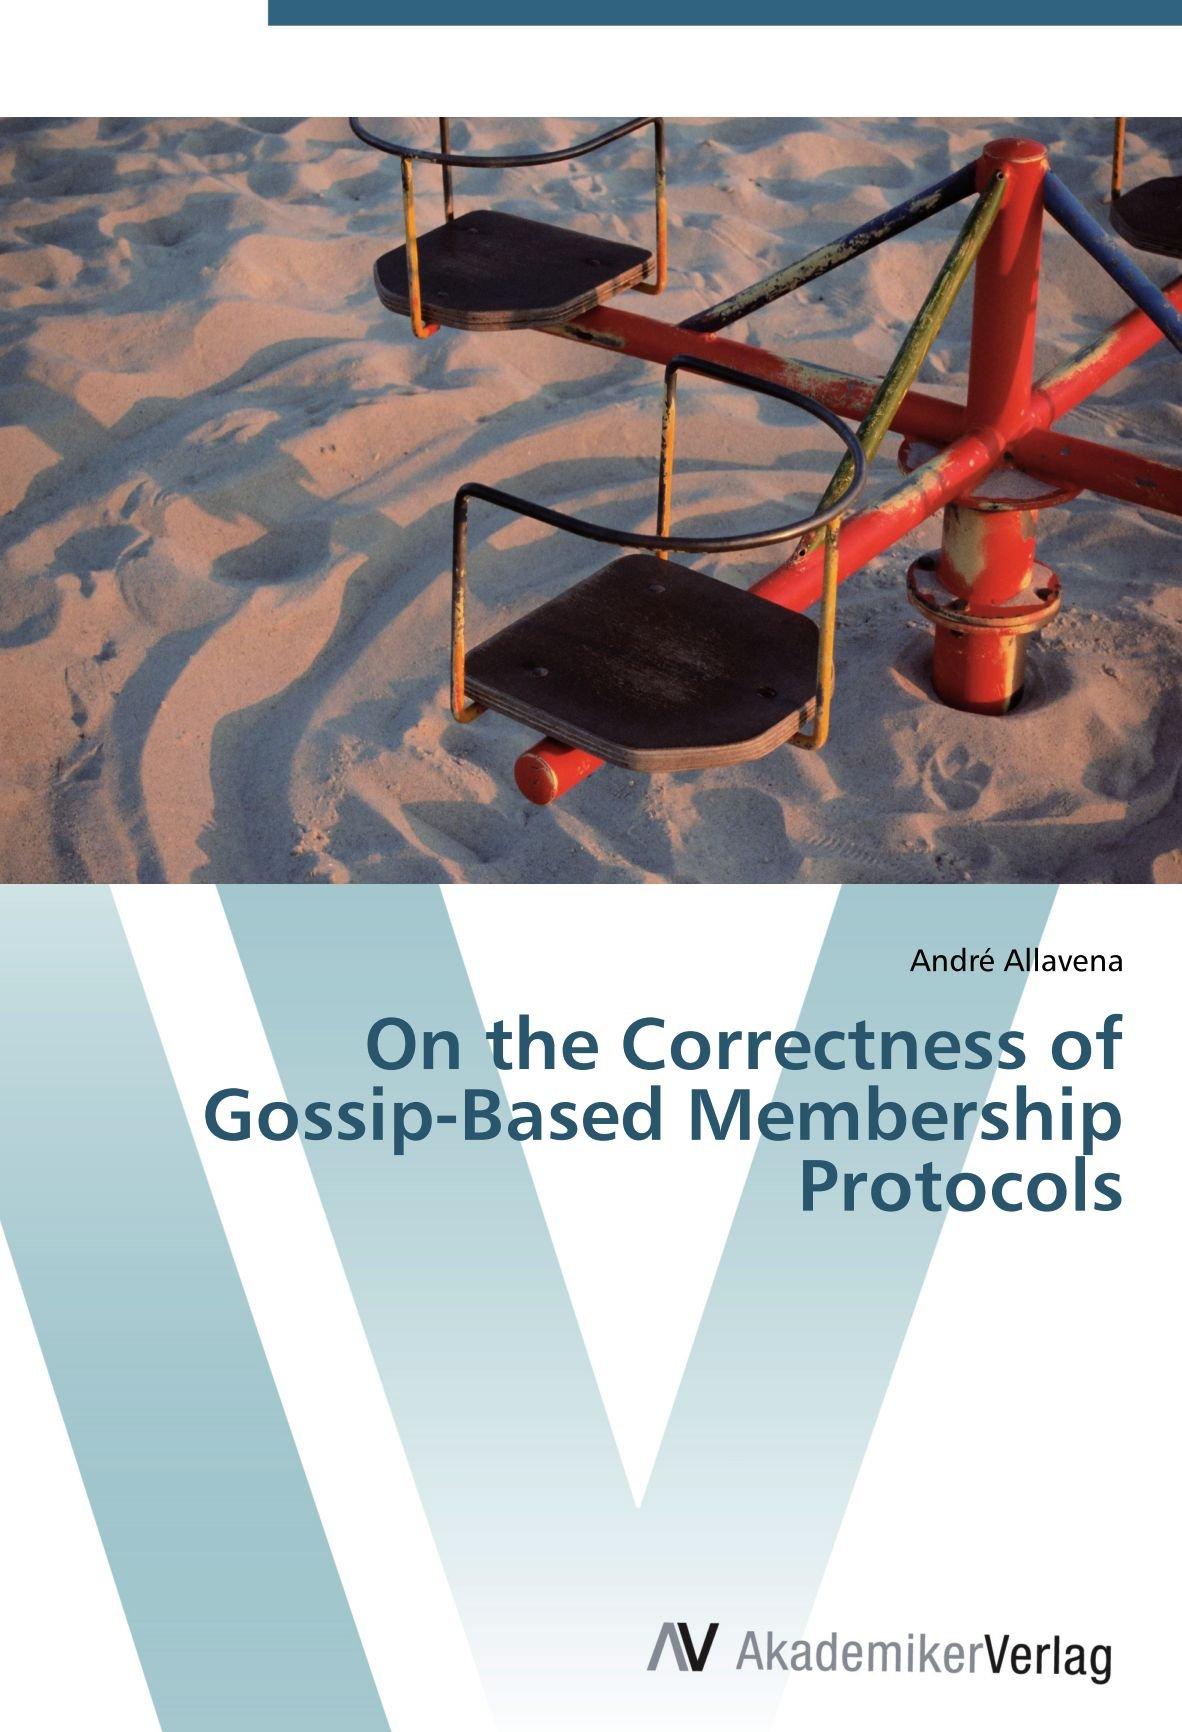 On the Correctness of Gossip-Based Membership Protocols ebook